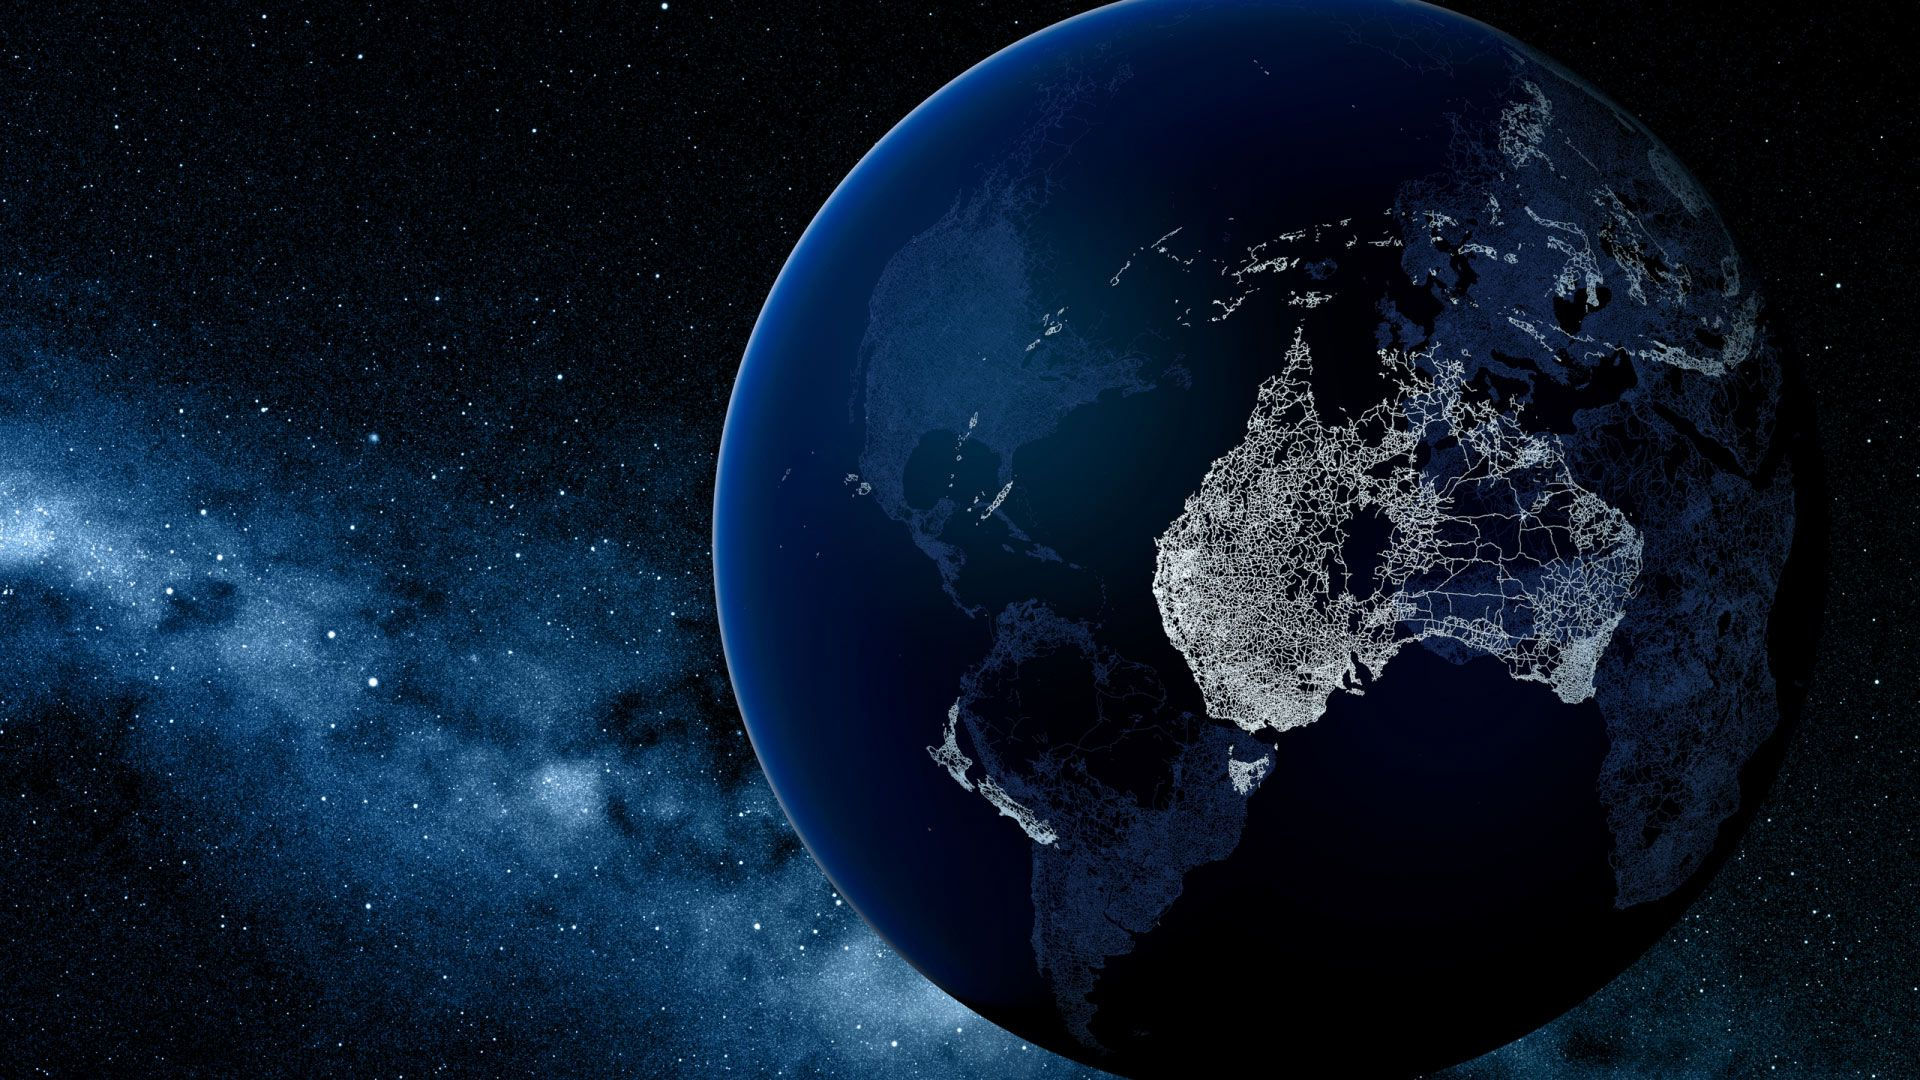 Earth full hd wallpaper download